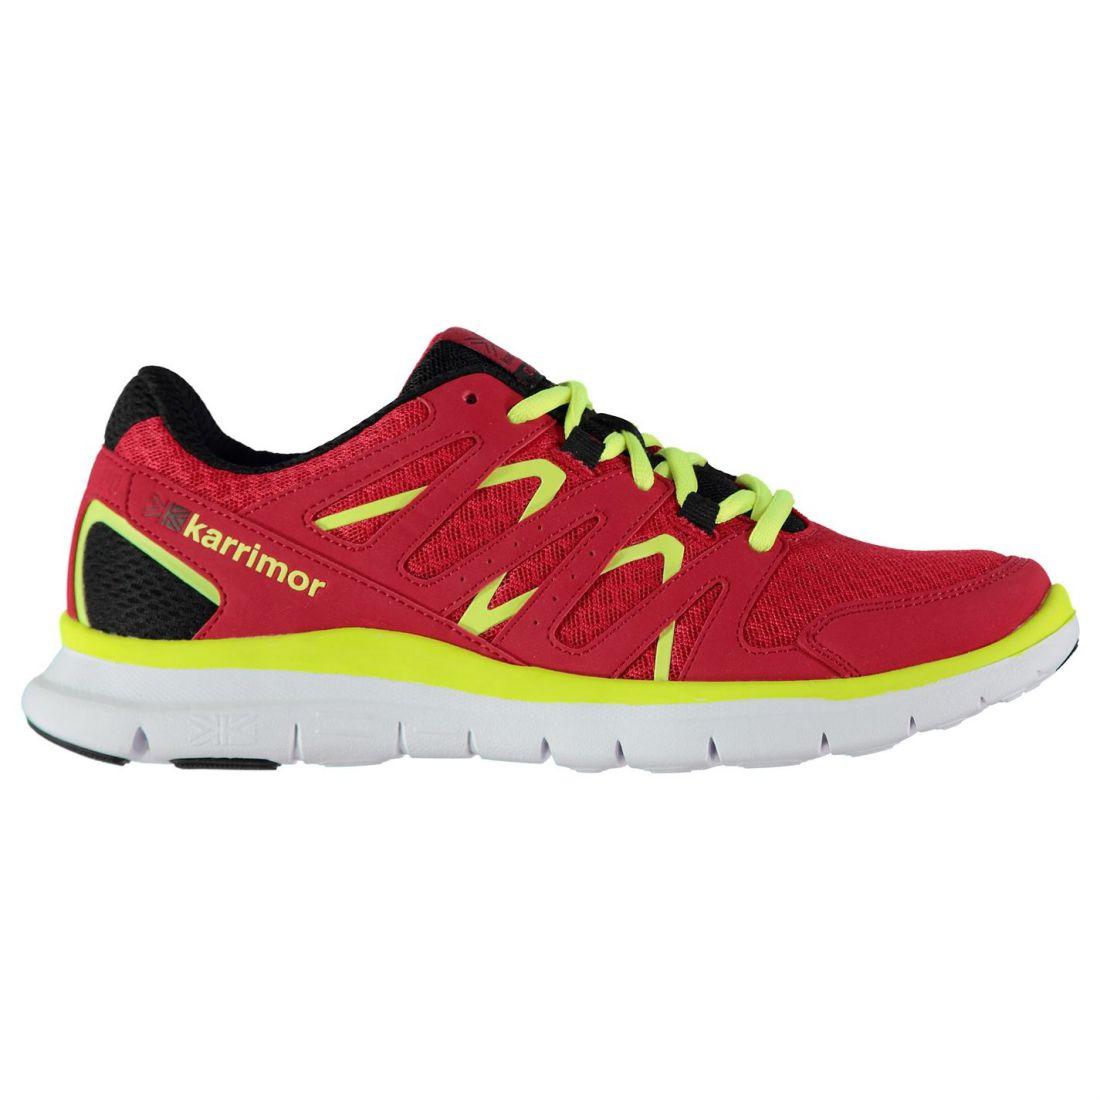 buy online 79d02 894b6 Karrimor Kids Duma Junior Girls Running Shoes Breathable Mesh Lace Up Sports